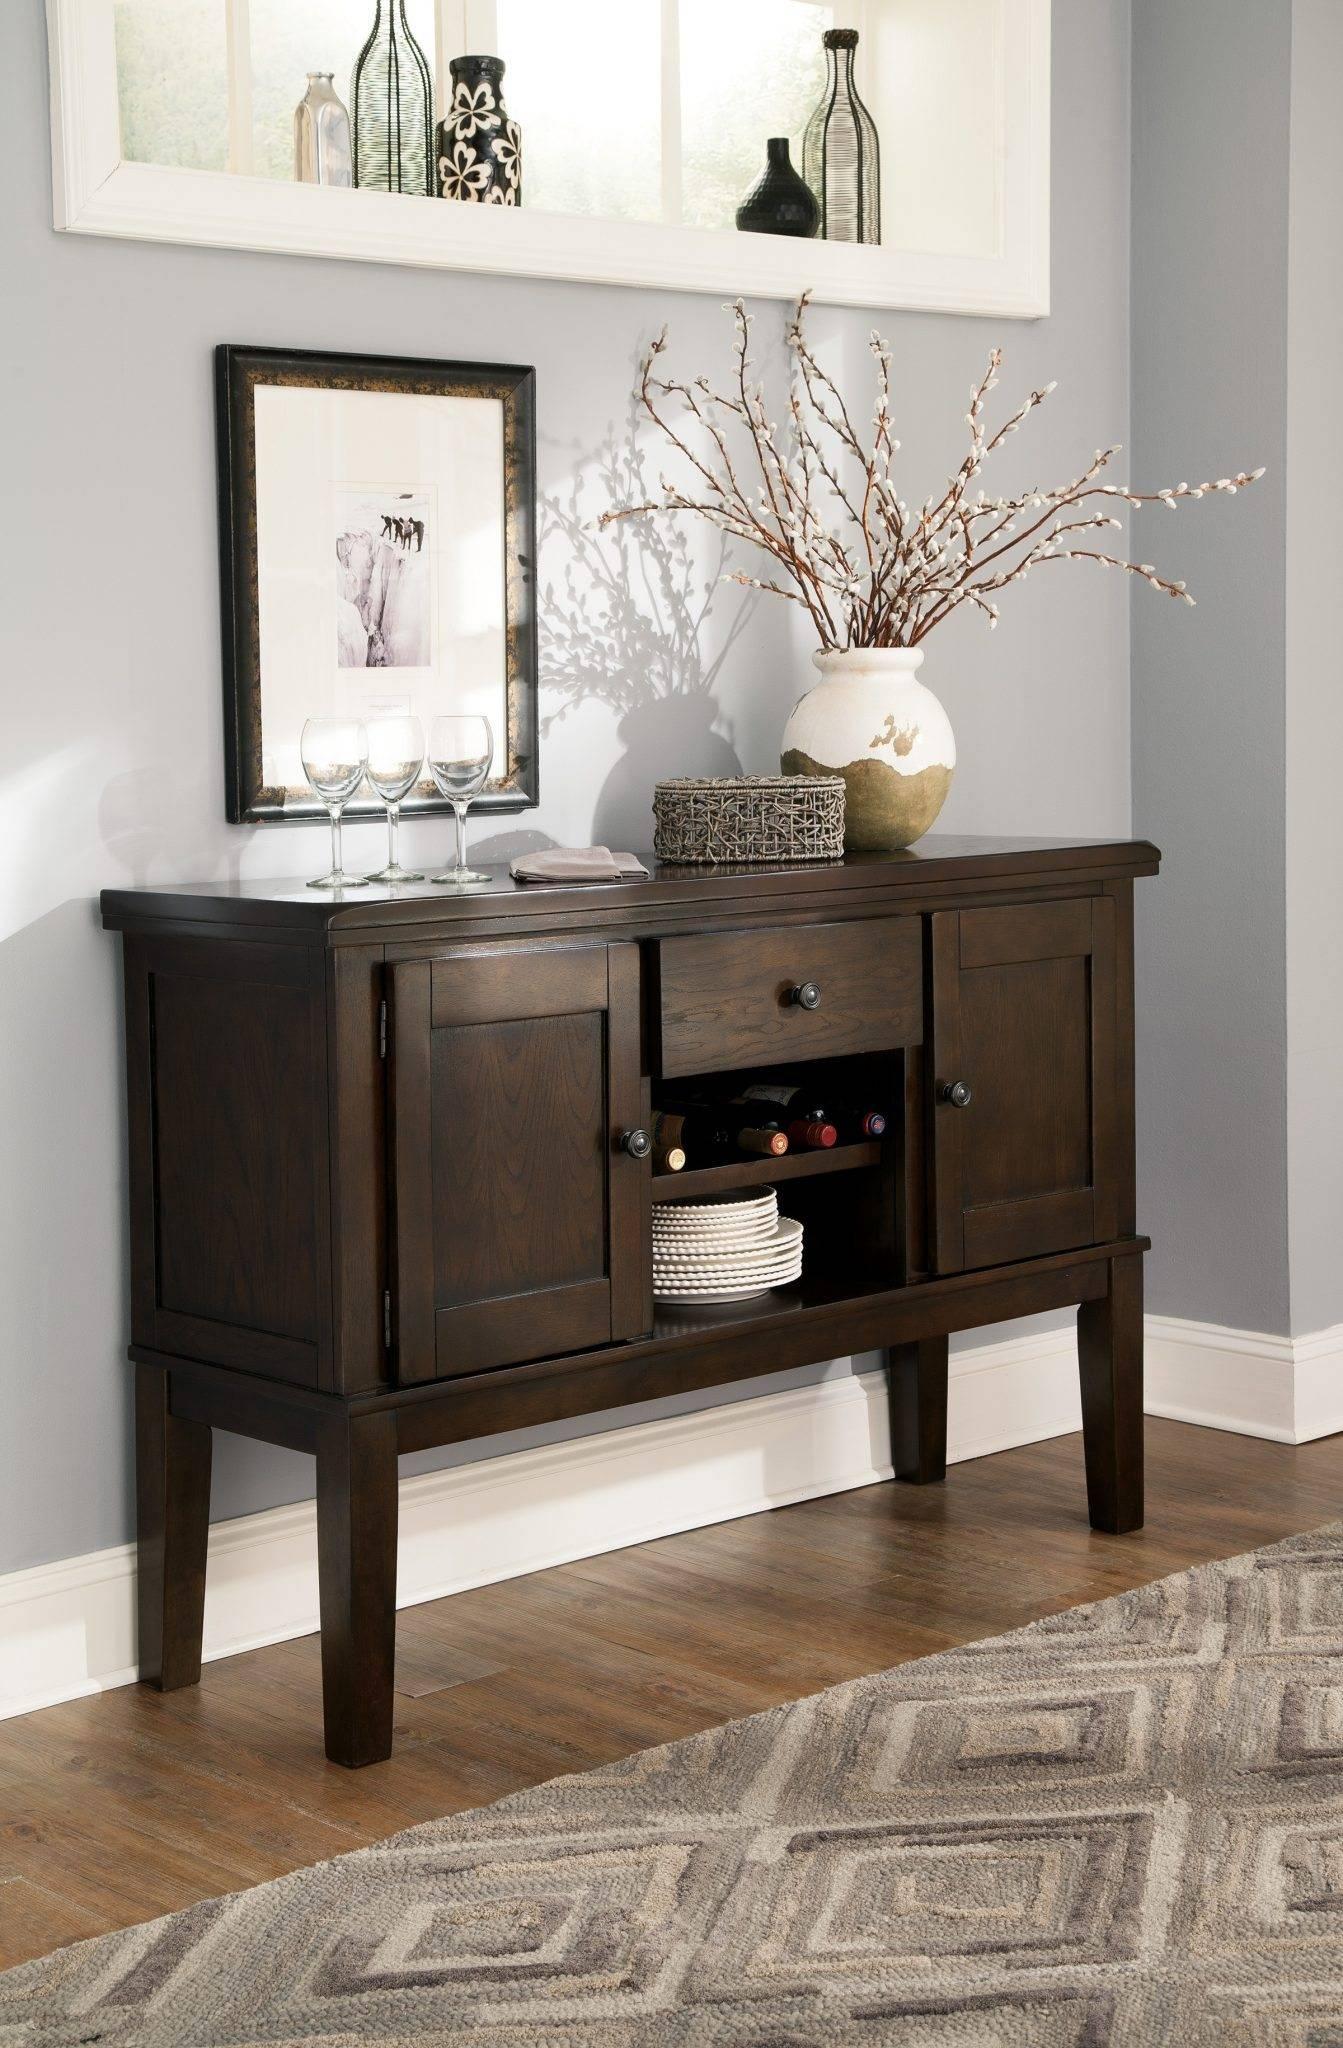 Best Furniture Mentor Oh: Furniture Store – Ashley Furniture Inside Ashley Tufted Sofa (Image 11 of 30)